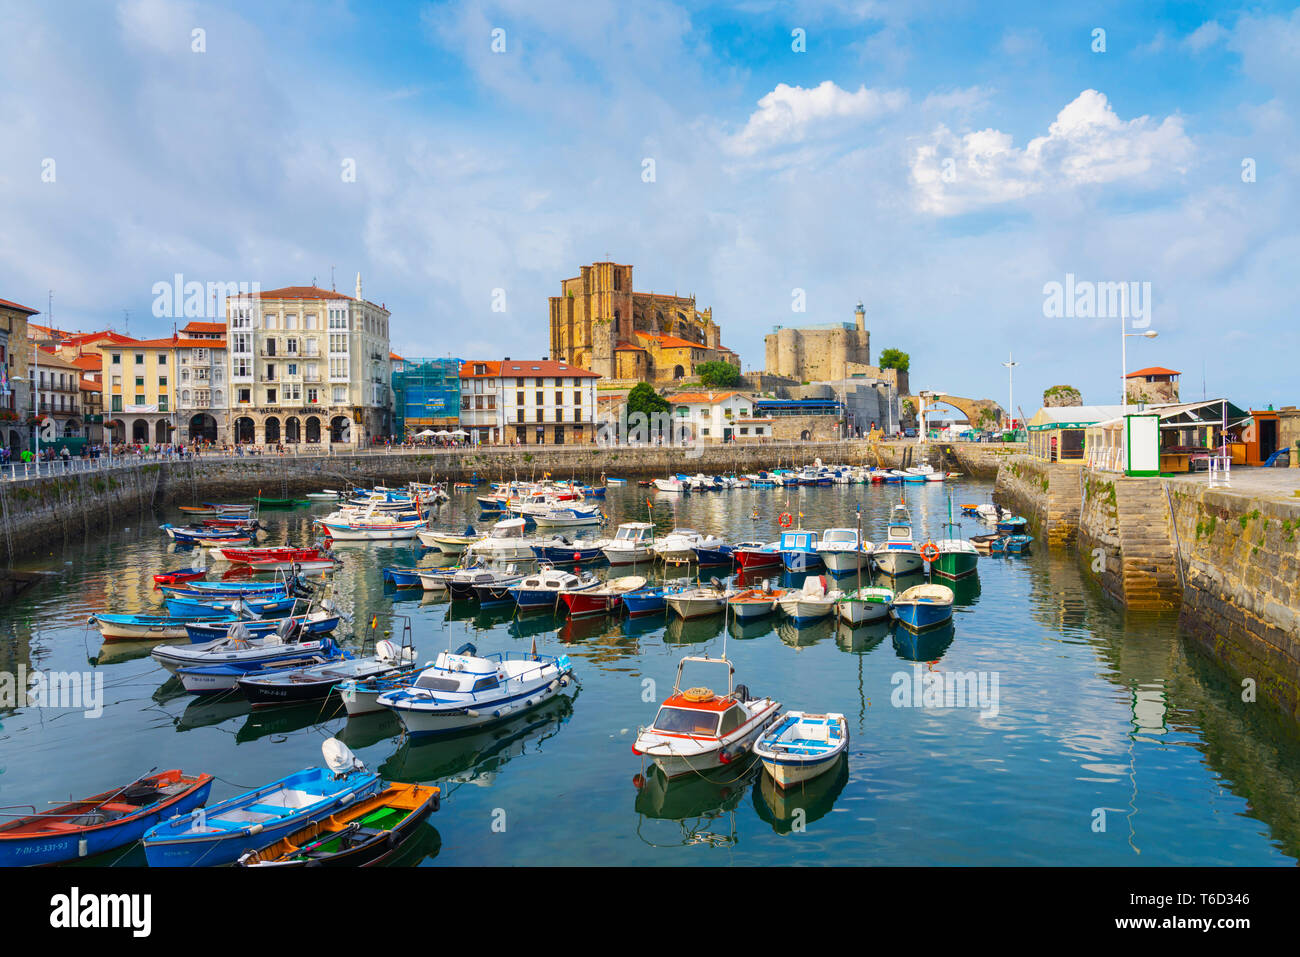 Spain, Cantabria, Castro-Urdiales, harbour, Santa Maria church and Santa Ana castle Stock Photo